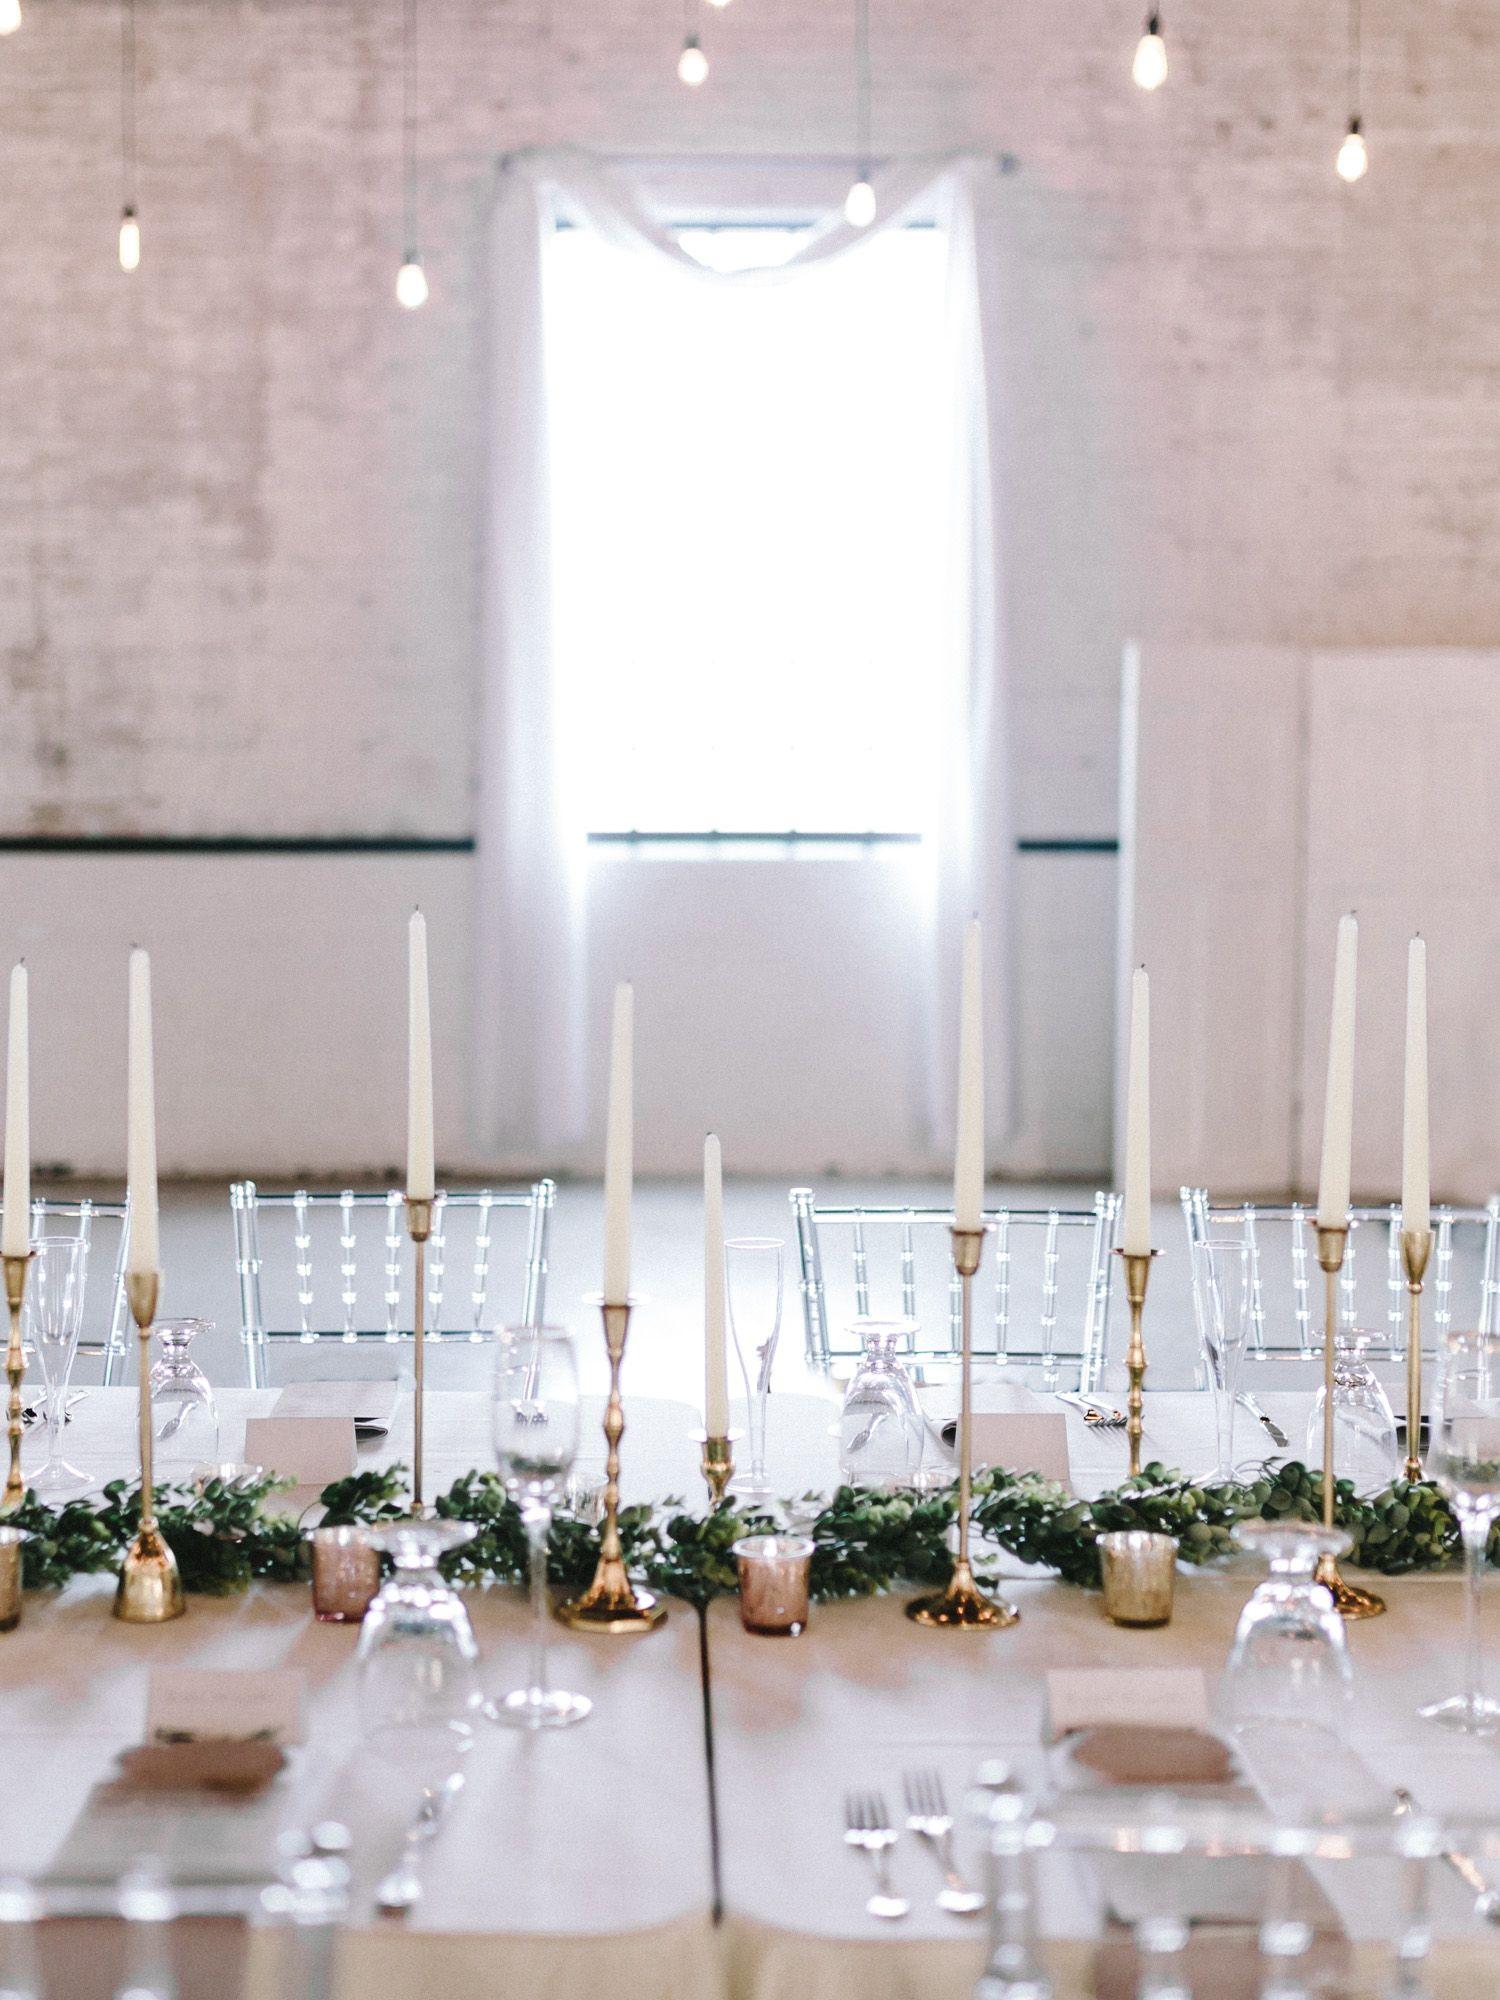 An Industrial Meets Ethereal Wedding at The Brick Hannah